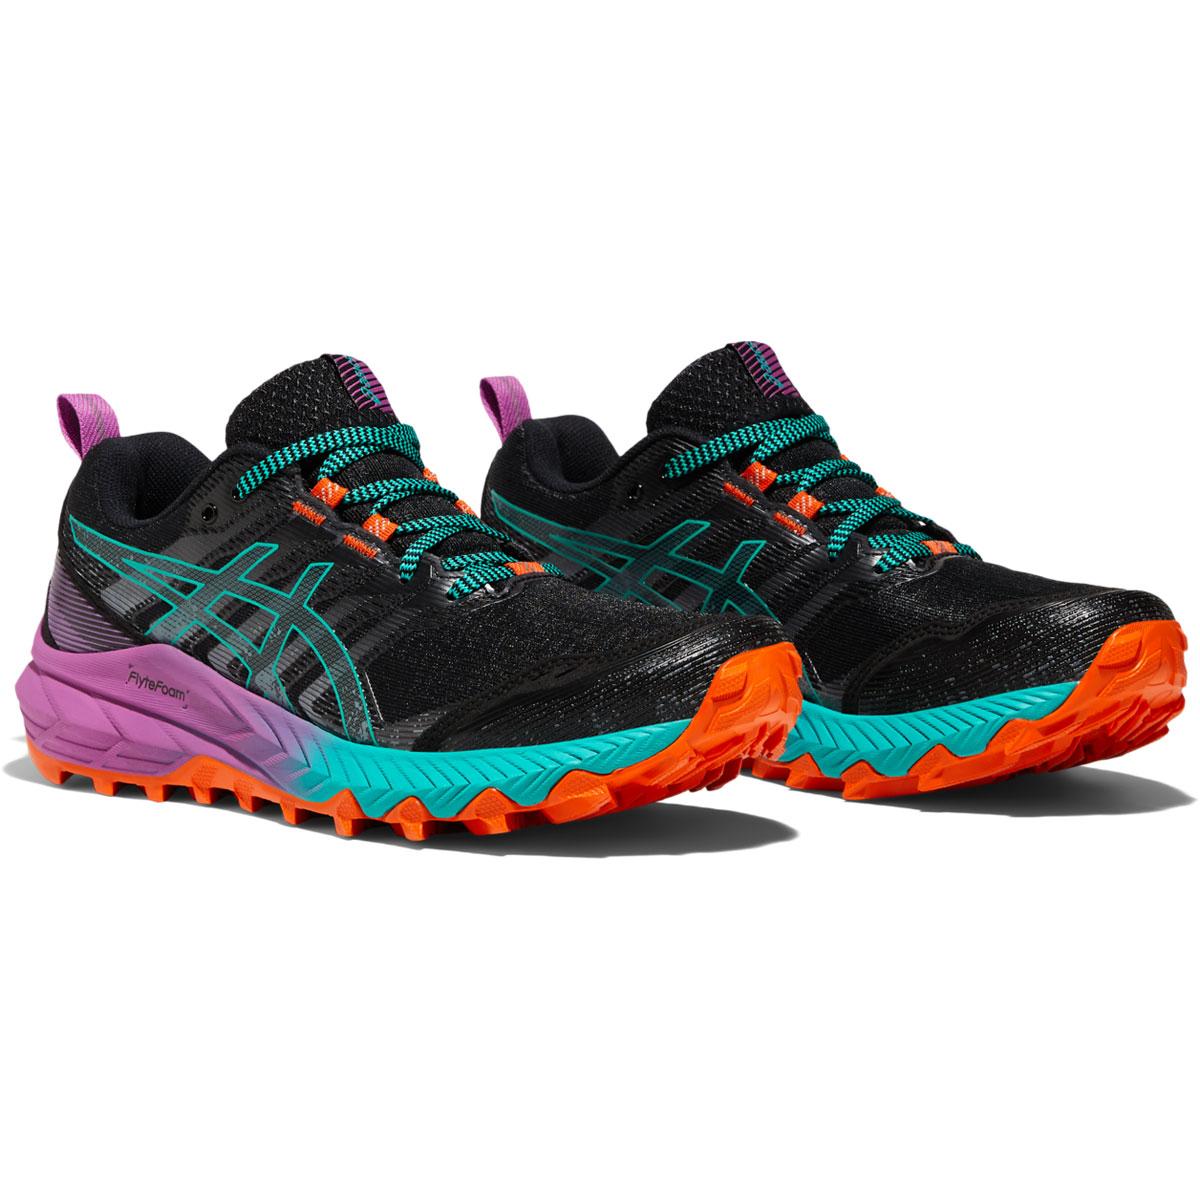 Women's Asics Gel-Trabuco 9 Running Shoe - Color: Black/Baltic Jewel - Size: 5 - Width: Regular, Black/Baltic Jewel, large, image 4